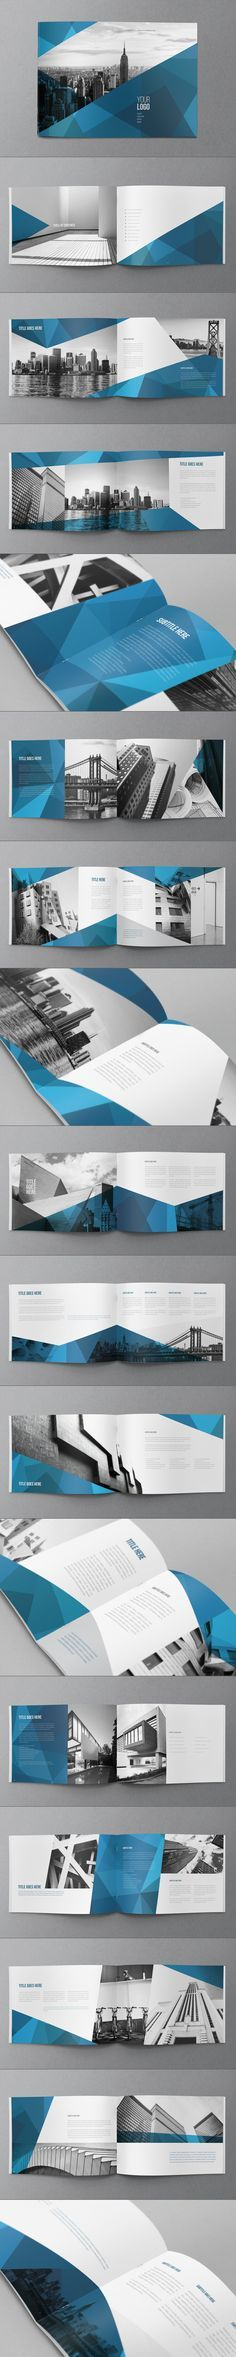 diseño de revistas, brouchure, flyers, etc.